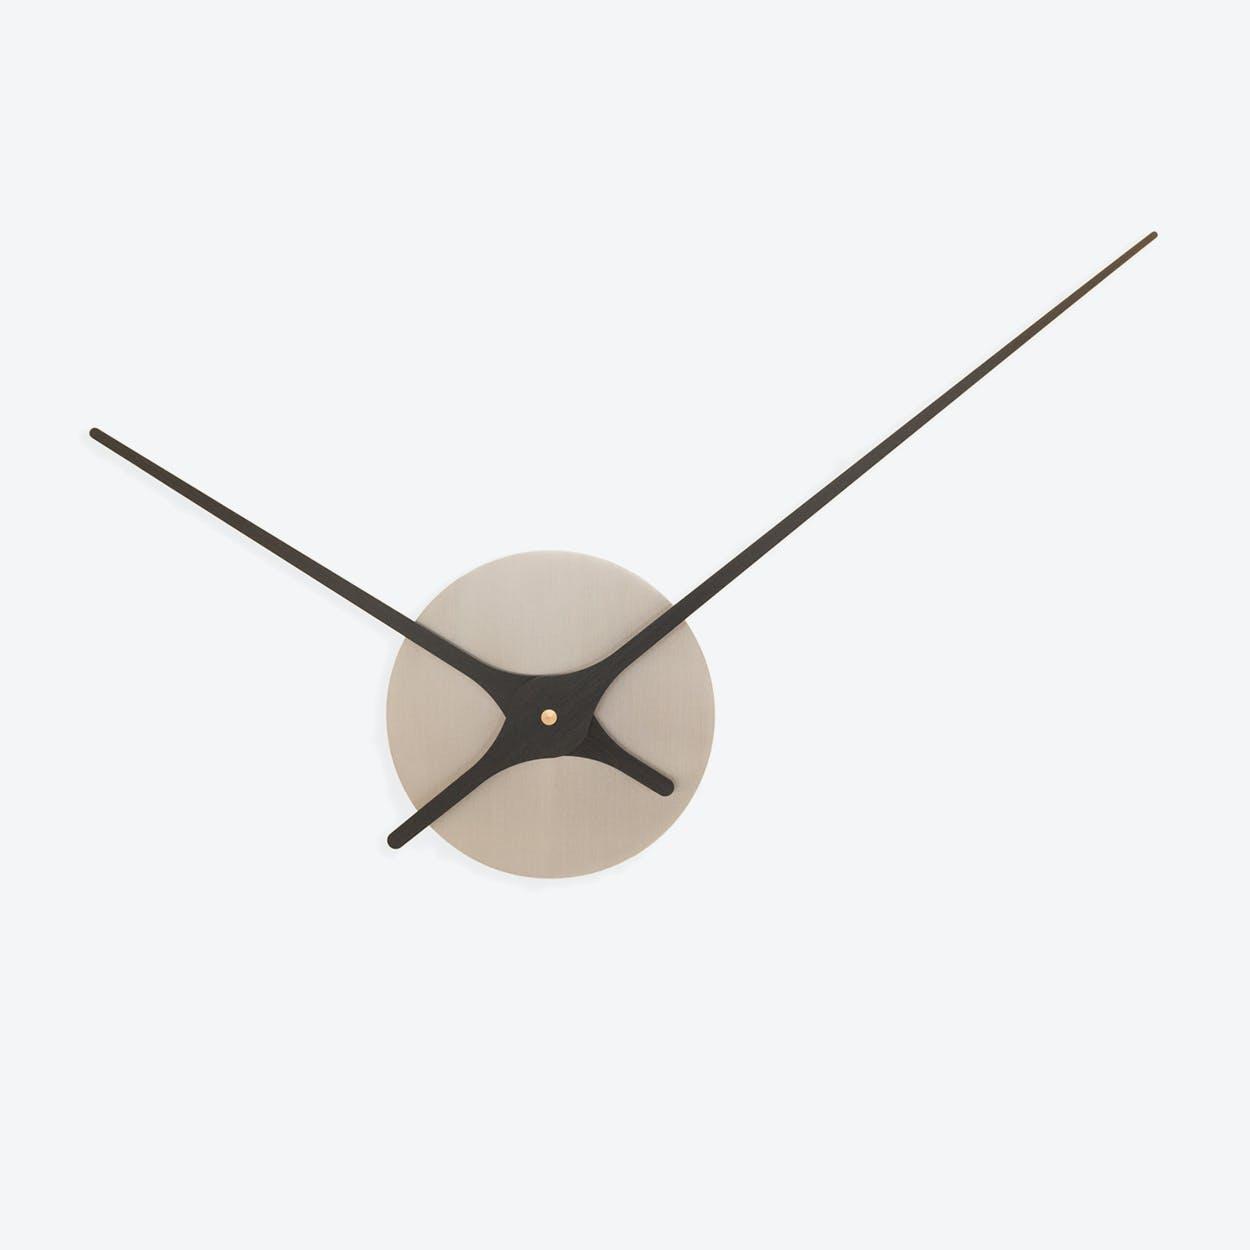 Lilje Wall Clock - Stainless Steel & Black Aluminium